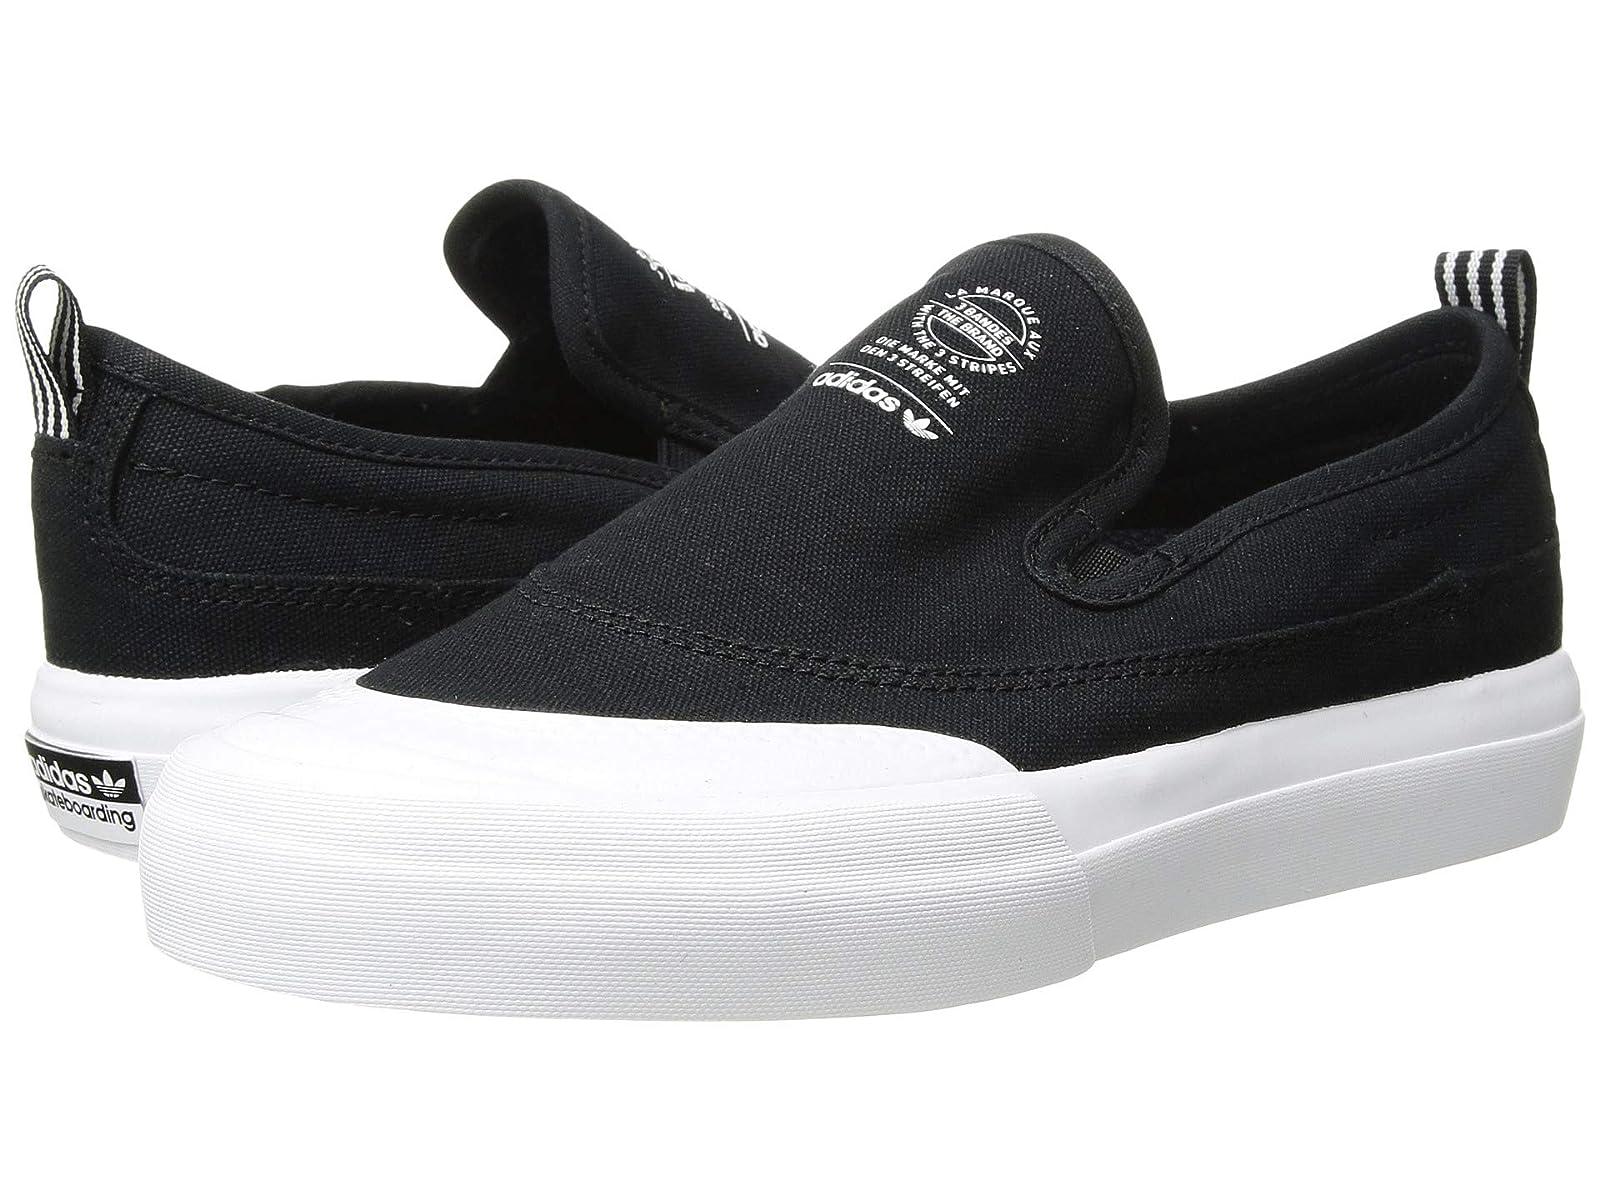 Men's/Women's:adidas Skateboarding Matchcourt Slip: Different Different Slip: goods 58ac06